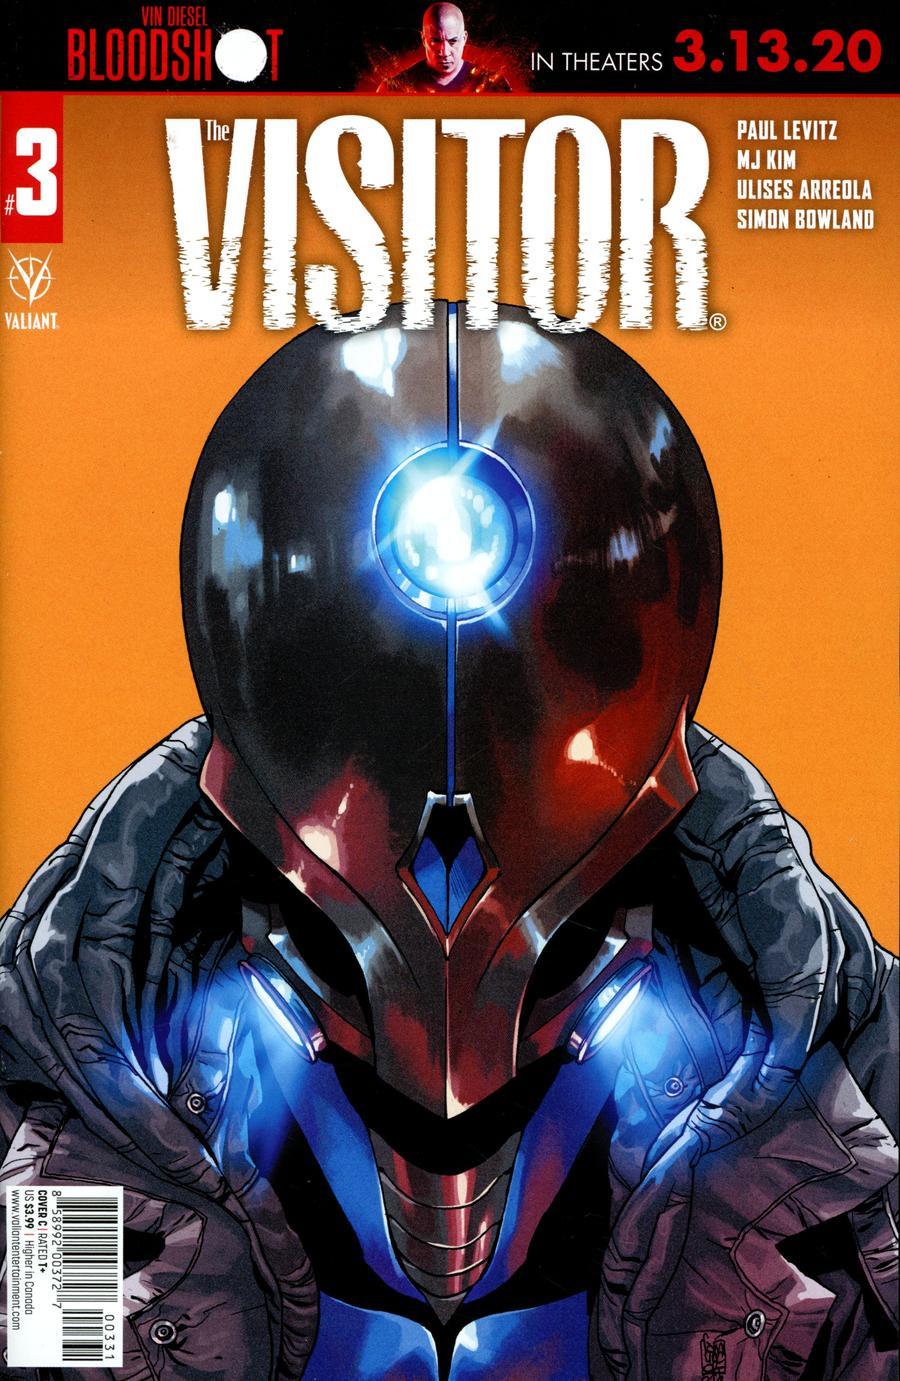 Visitor Vol 2 #3 Cover C Variant Giuseppe Camuncoli Cover